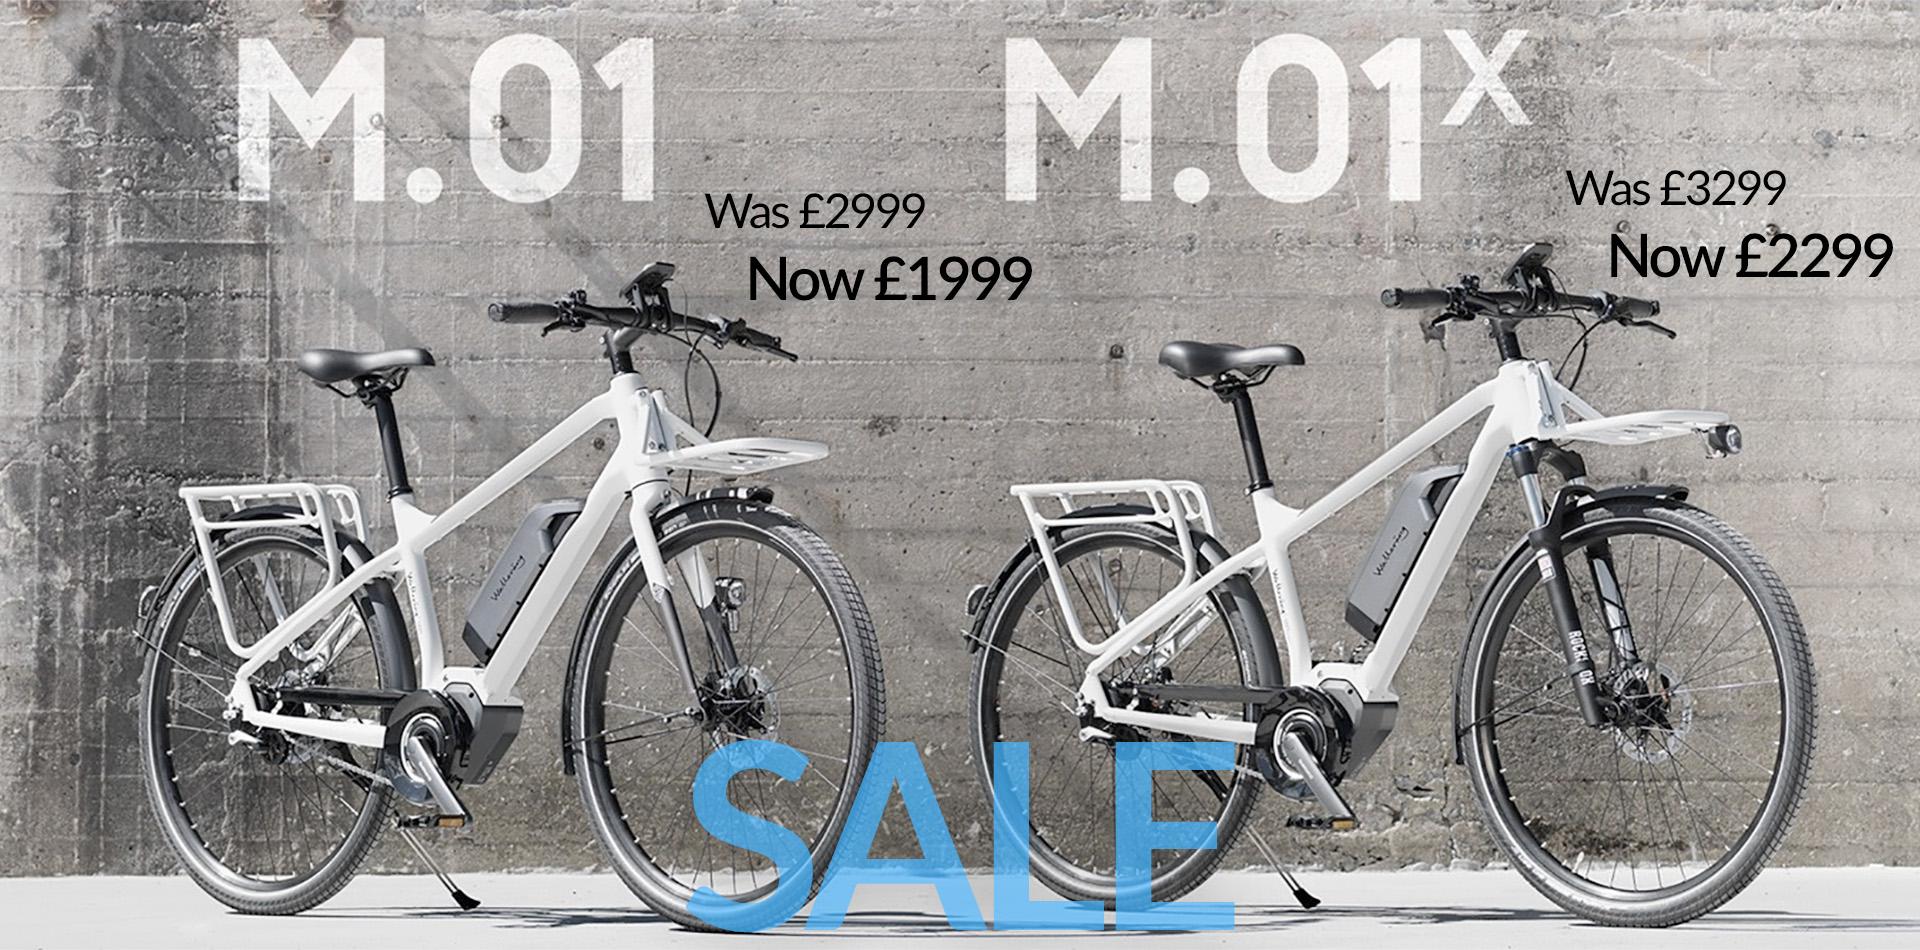 https://electric-bike-store.co.uk/wp-content/uploads/2018/02/wallerang-flash-sale.jpg